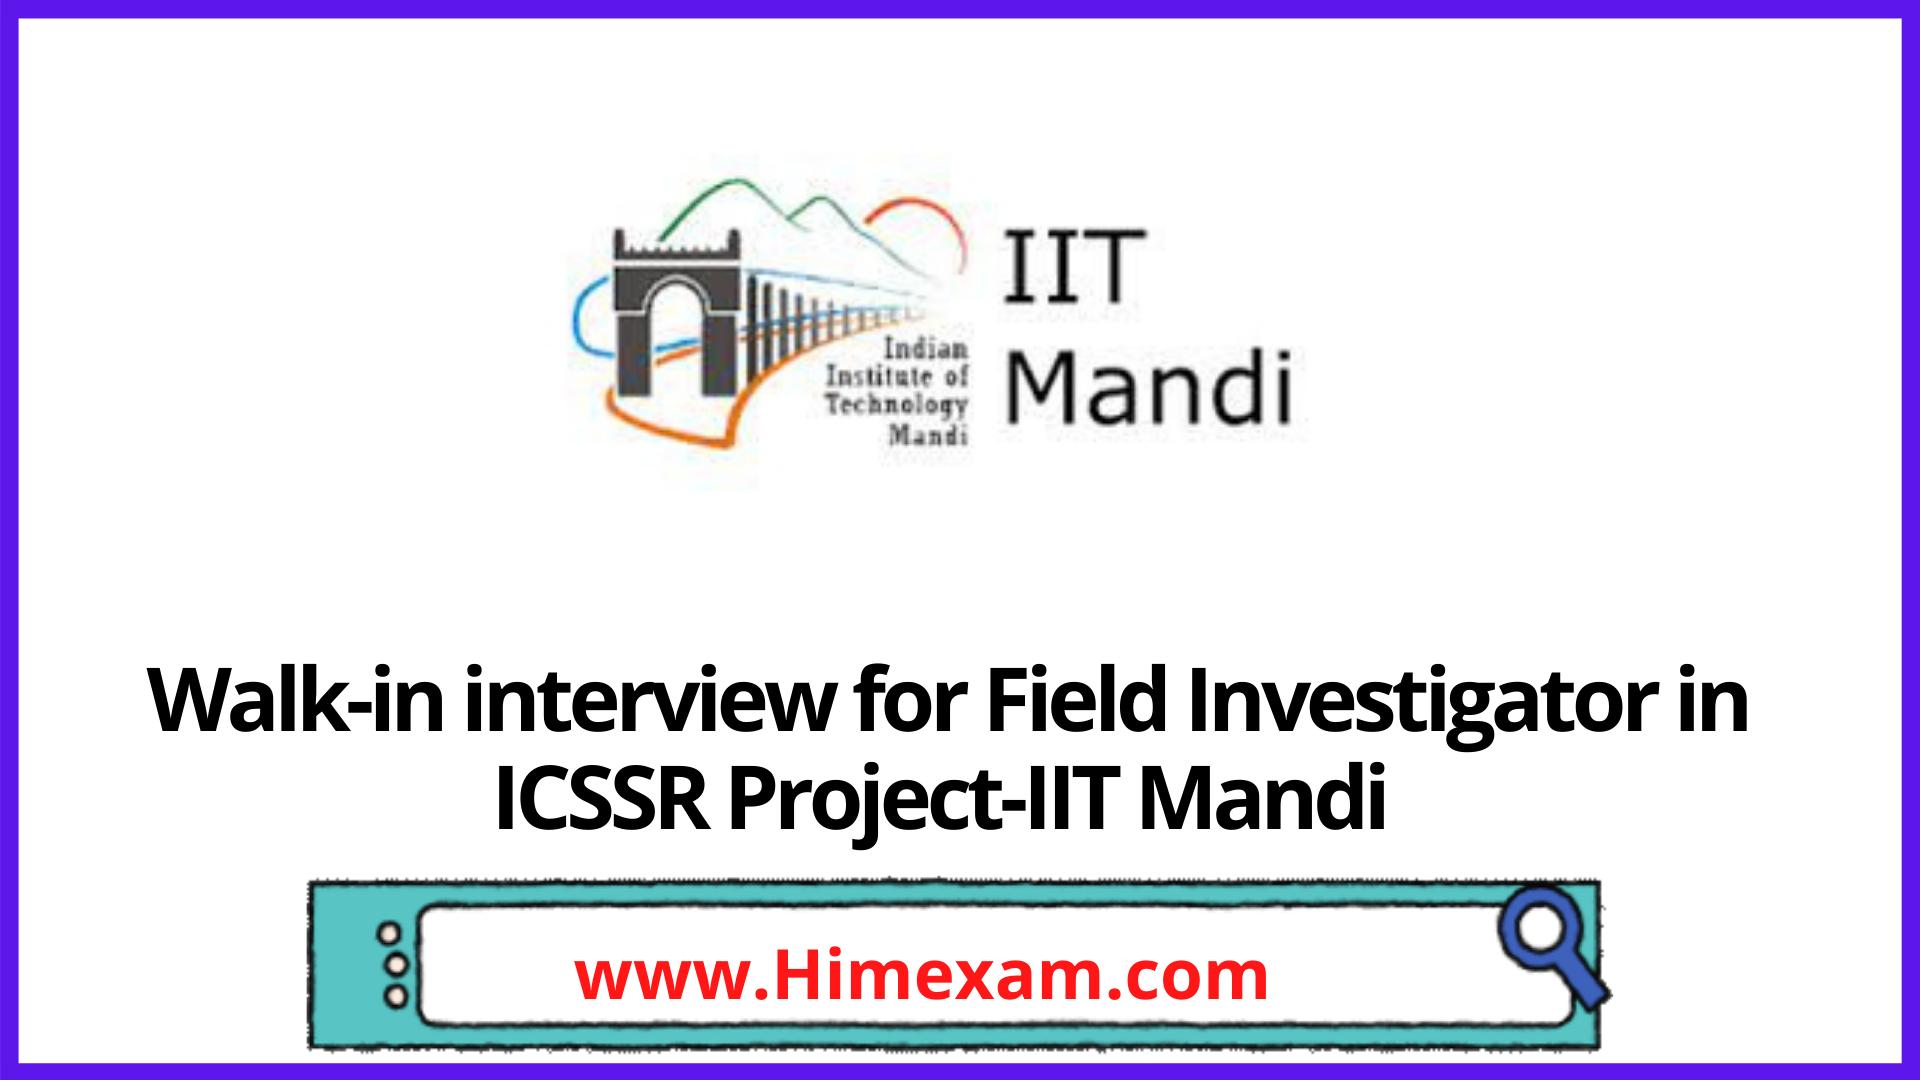 Walk-in interview for Field Investigator in ICSSR Project-IIT Mandi